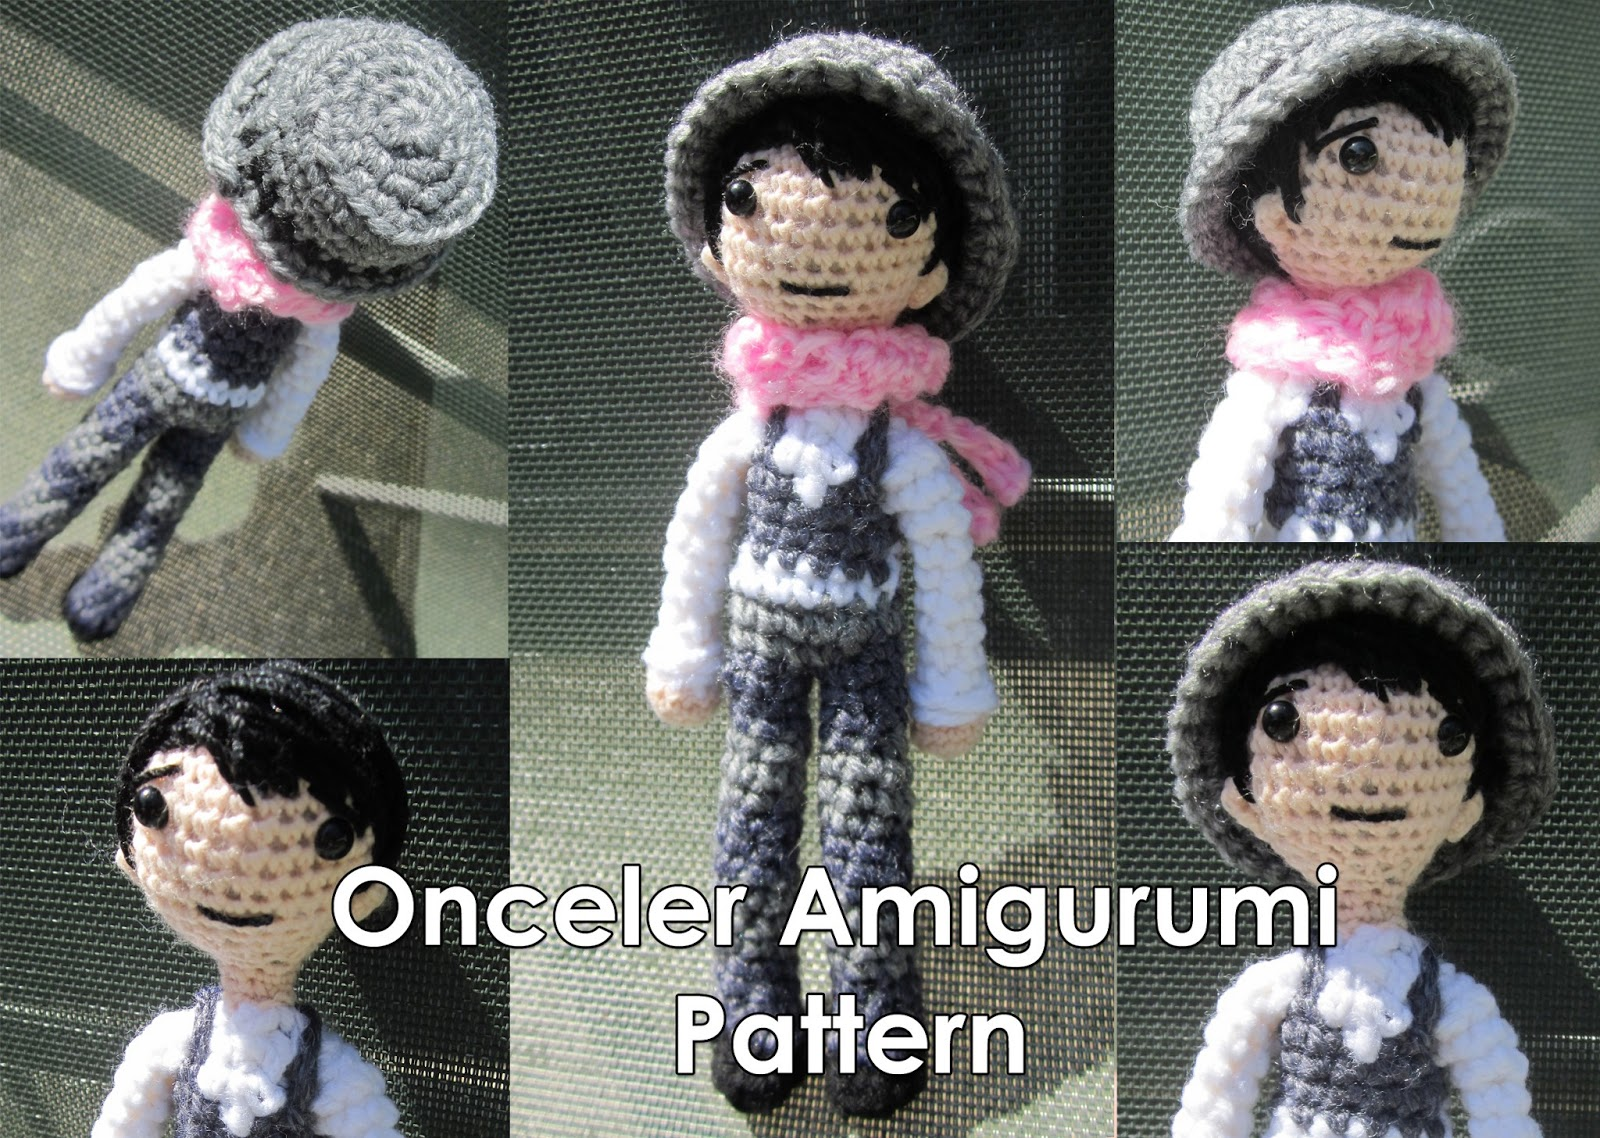 Free Amigurumi Boy Doll Patterns : Craft Sauce: The Onceler Amigurumi Pattern - From The Lorax